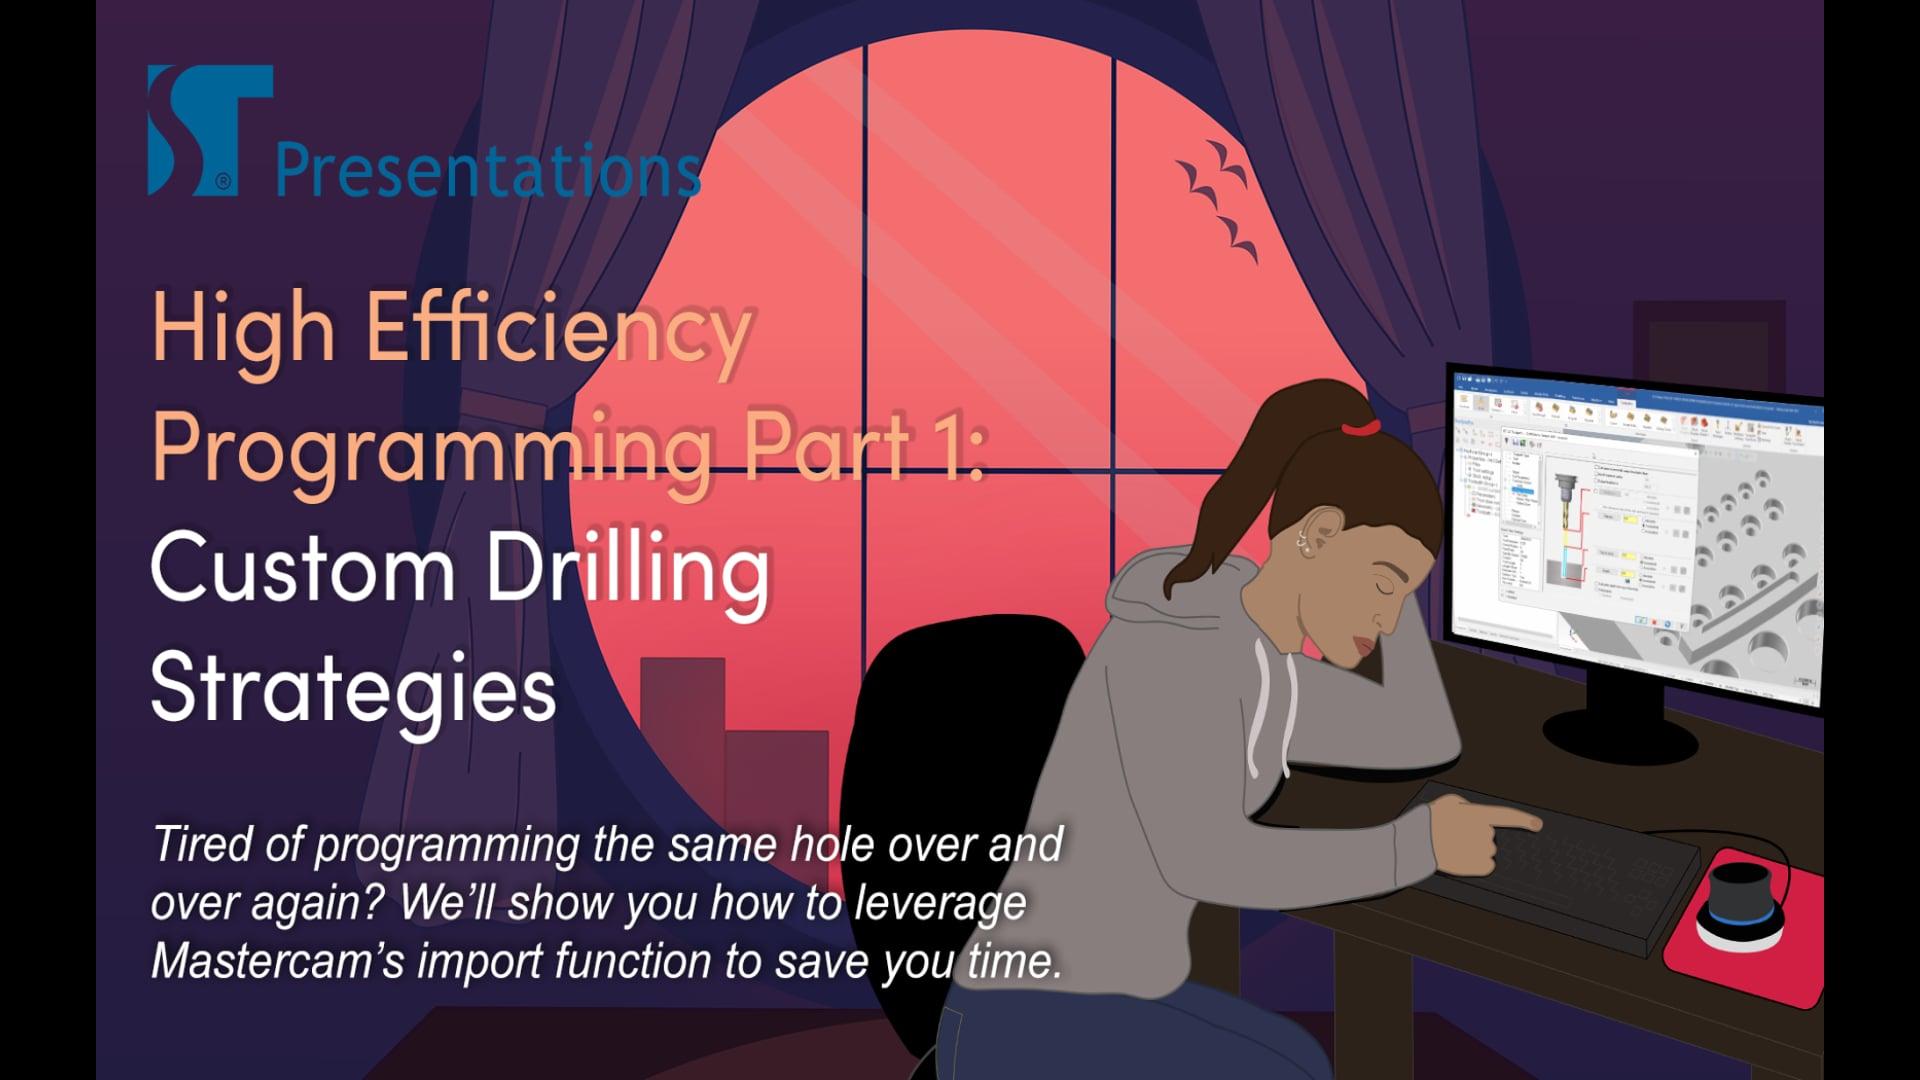 High Efficiency Programming Part 1 - Custom Drilling Strategies